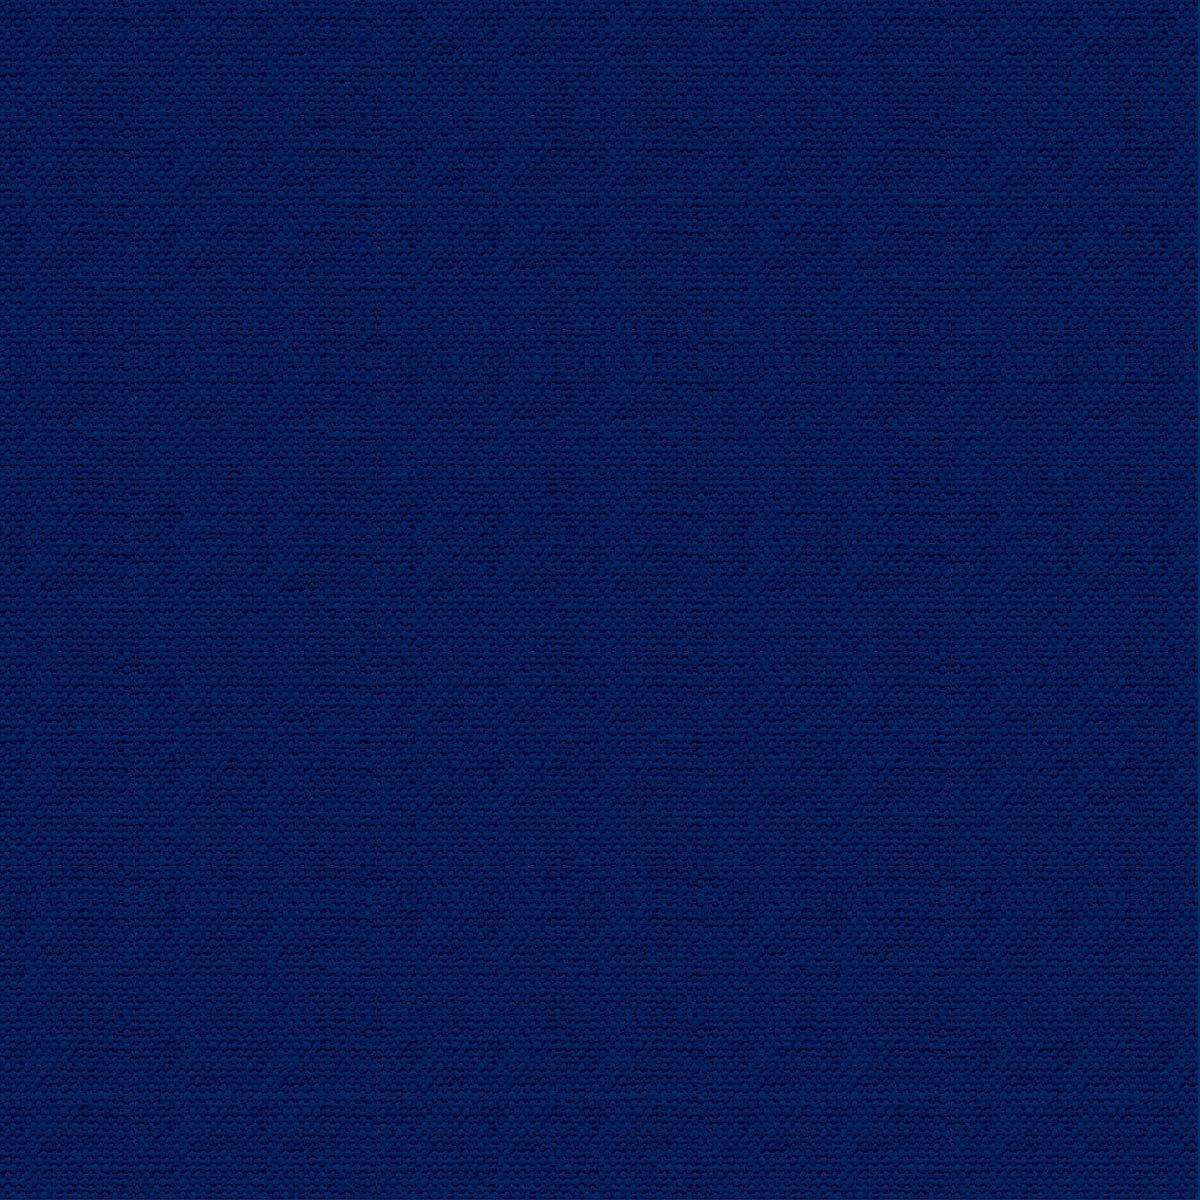 navy-blue-swatch.jpg